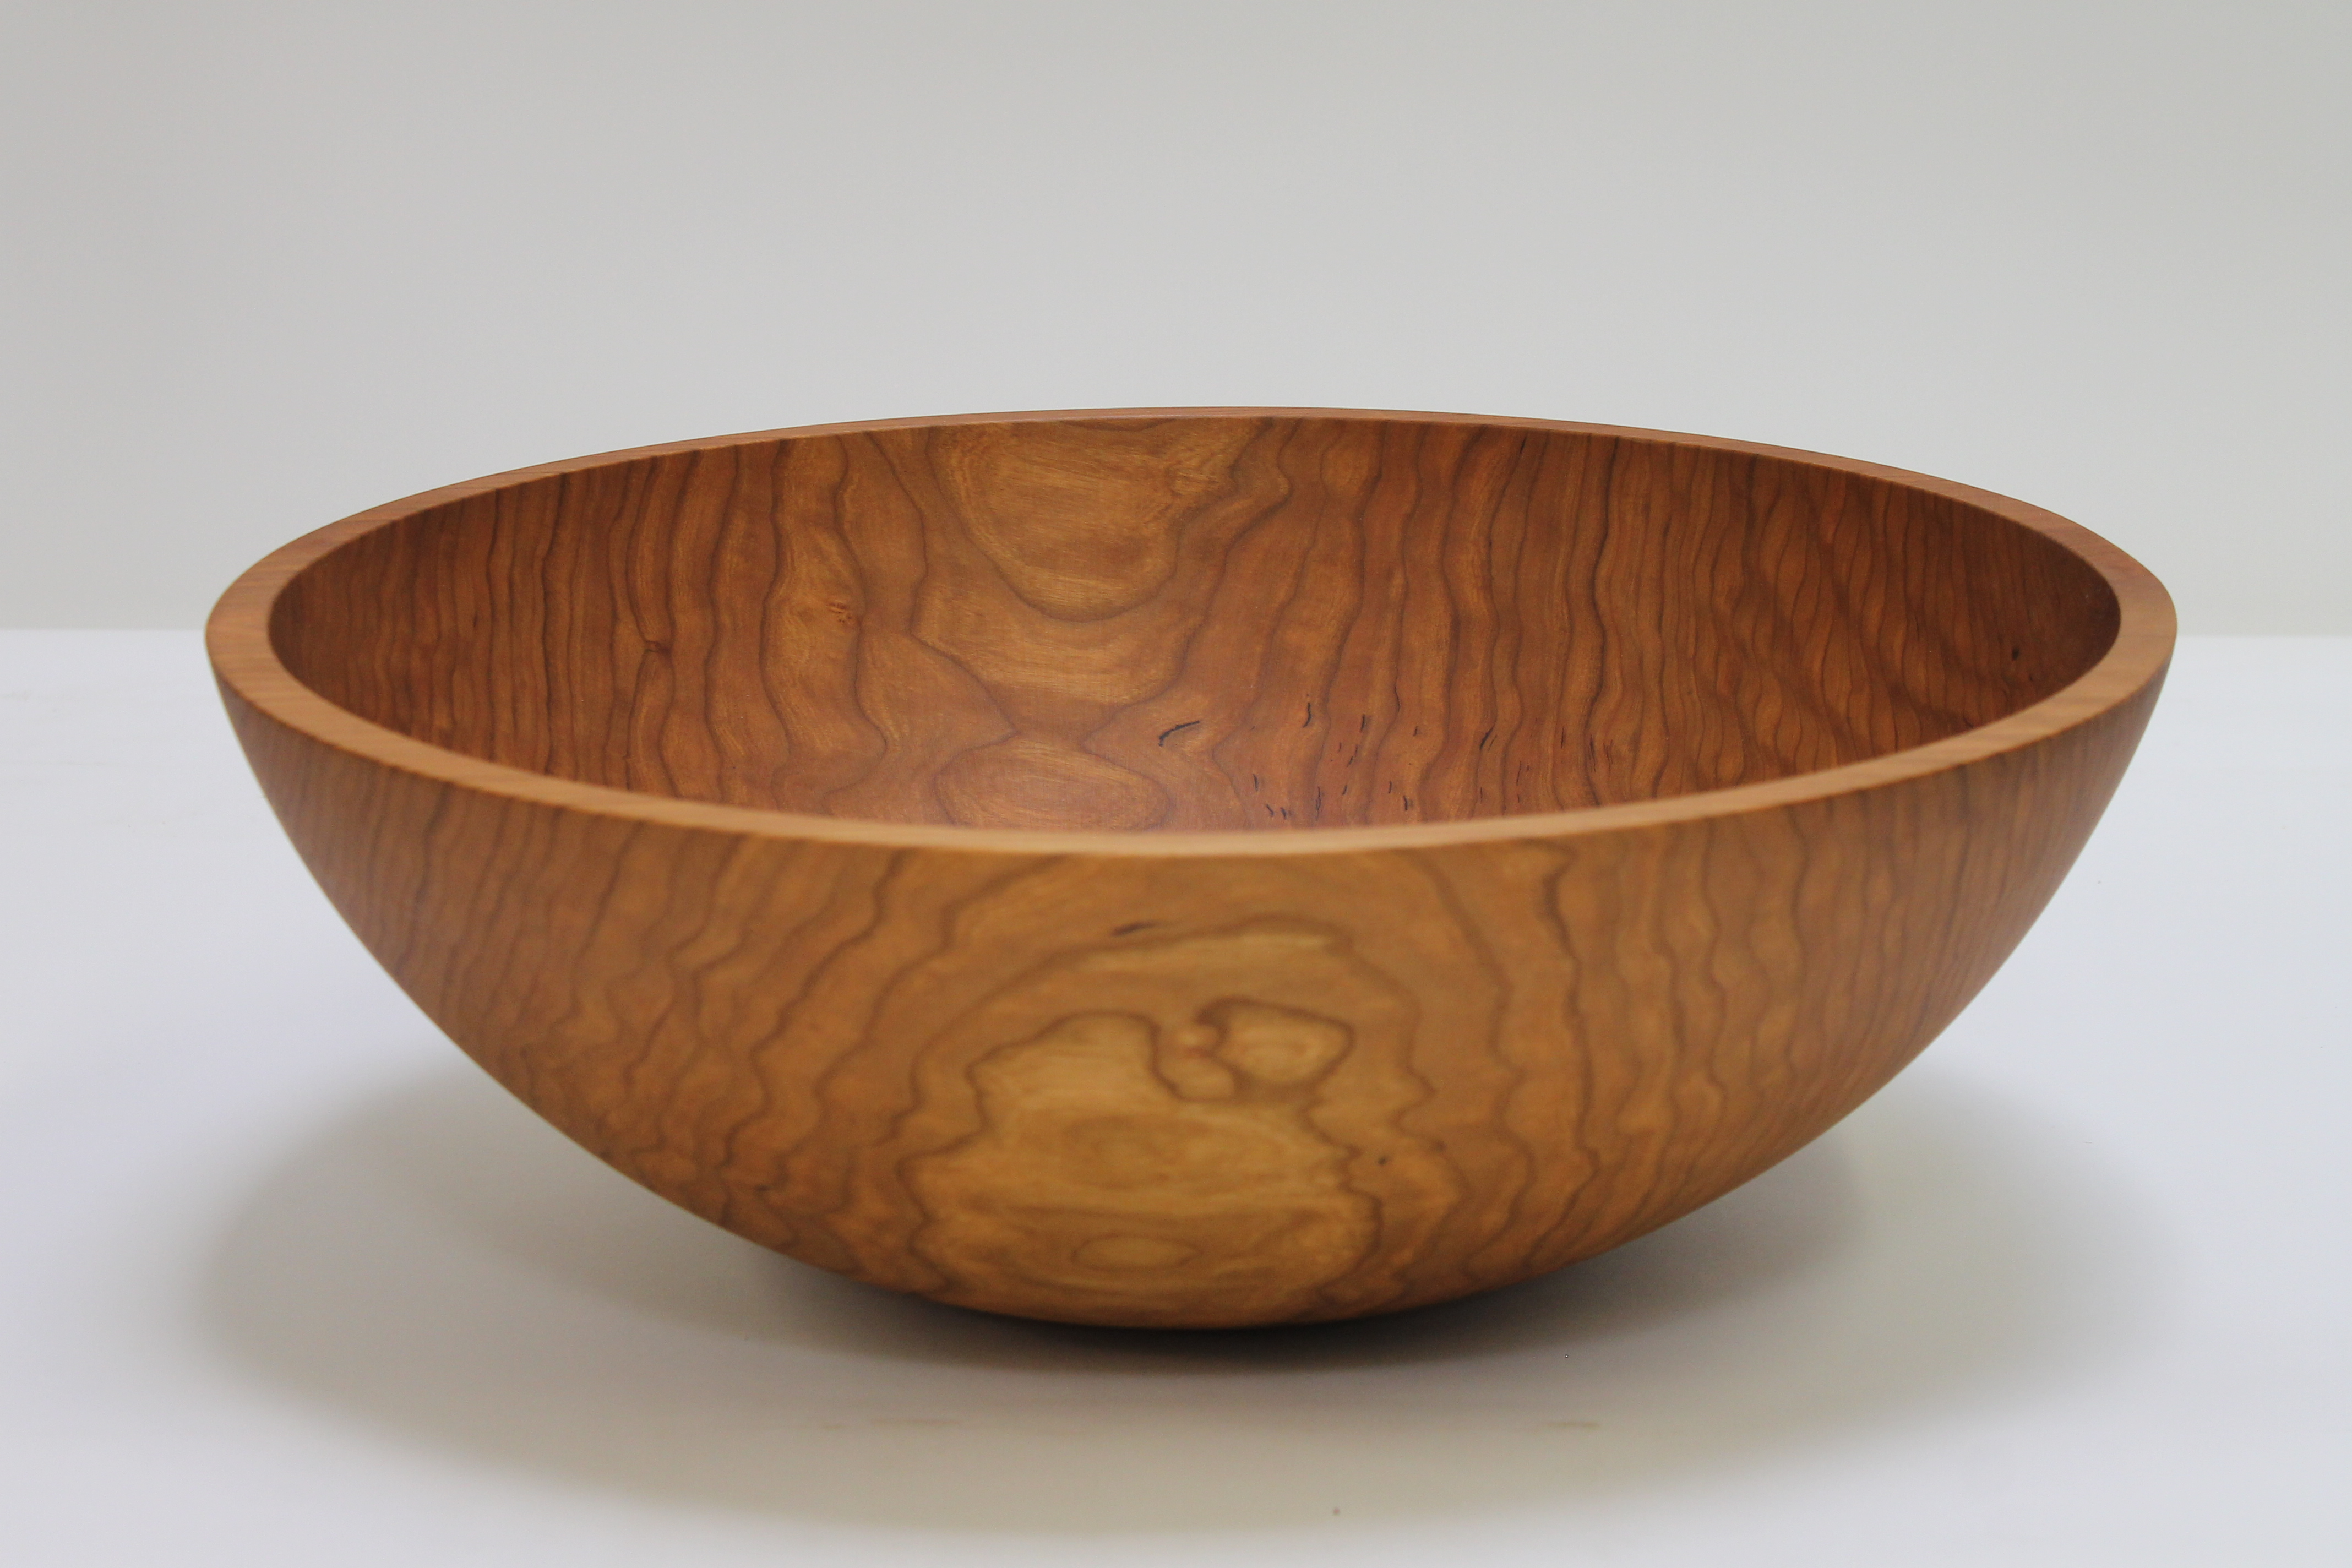 20 inch Cherry Bowl - Bee's Oil Finish C120B